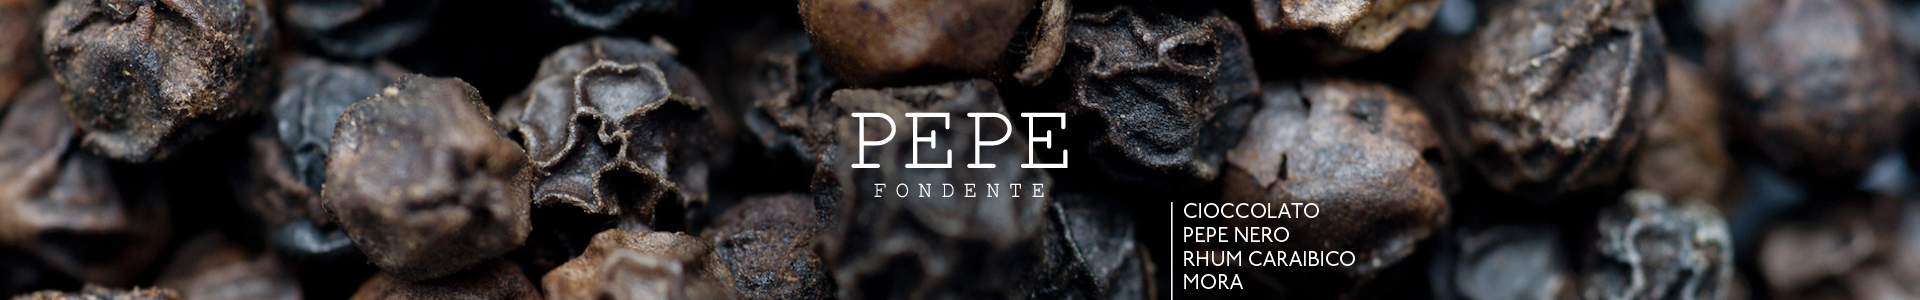 Pepe Fondente